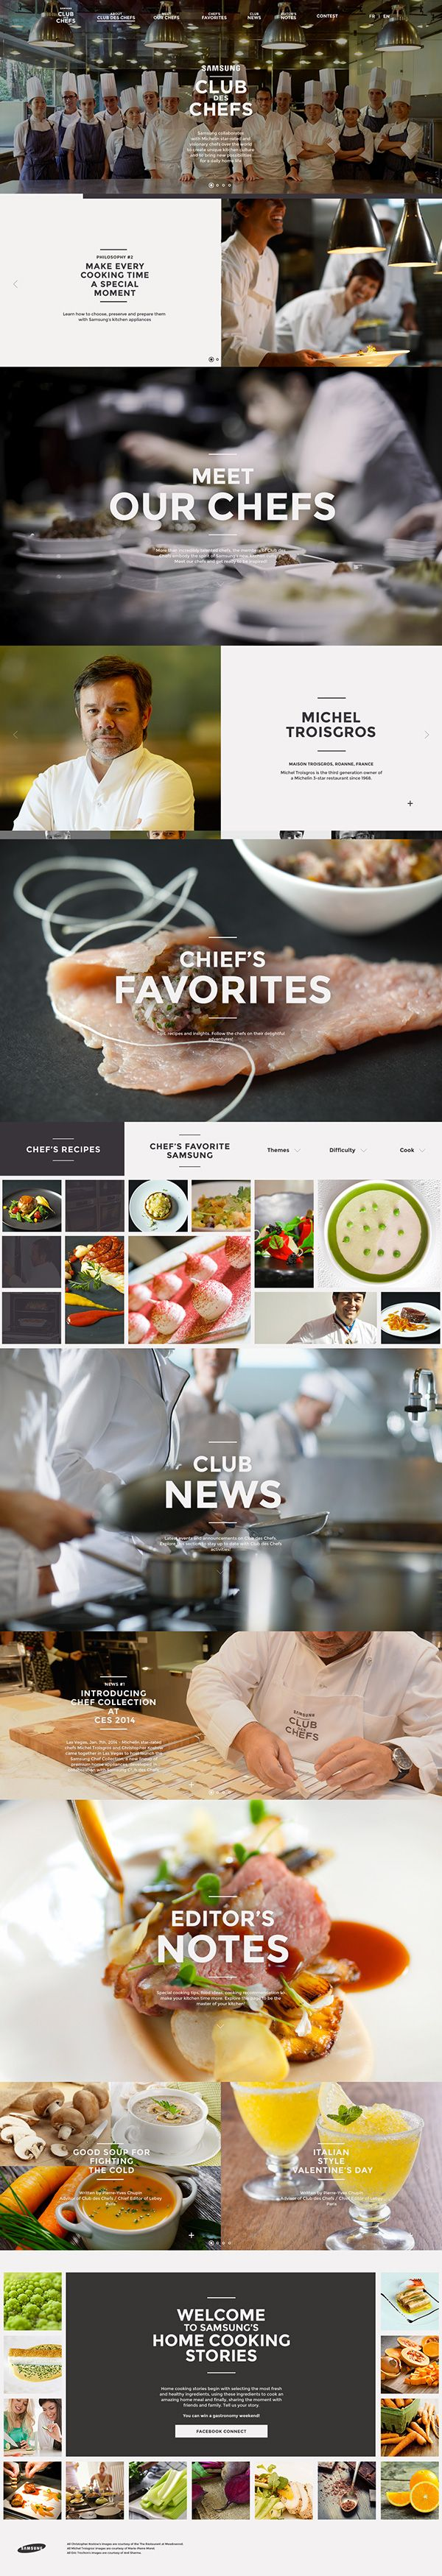 Samsung - Club des Chefs by Mathieu Debruyère, via Behance